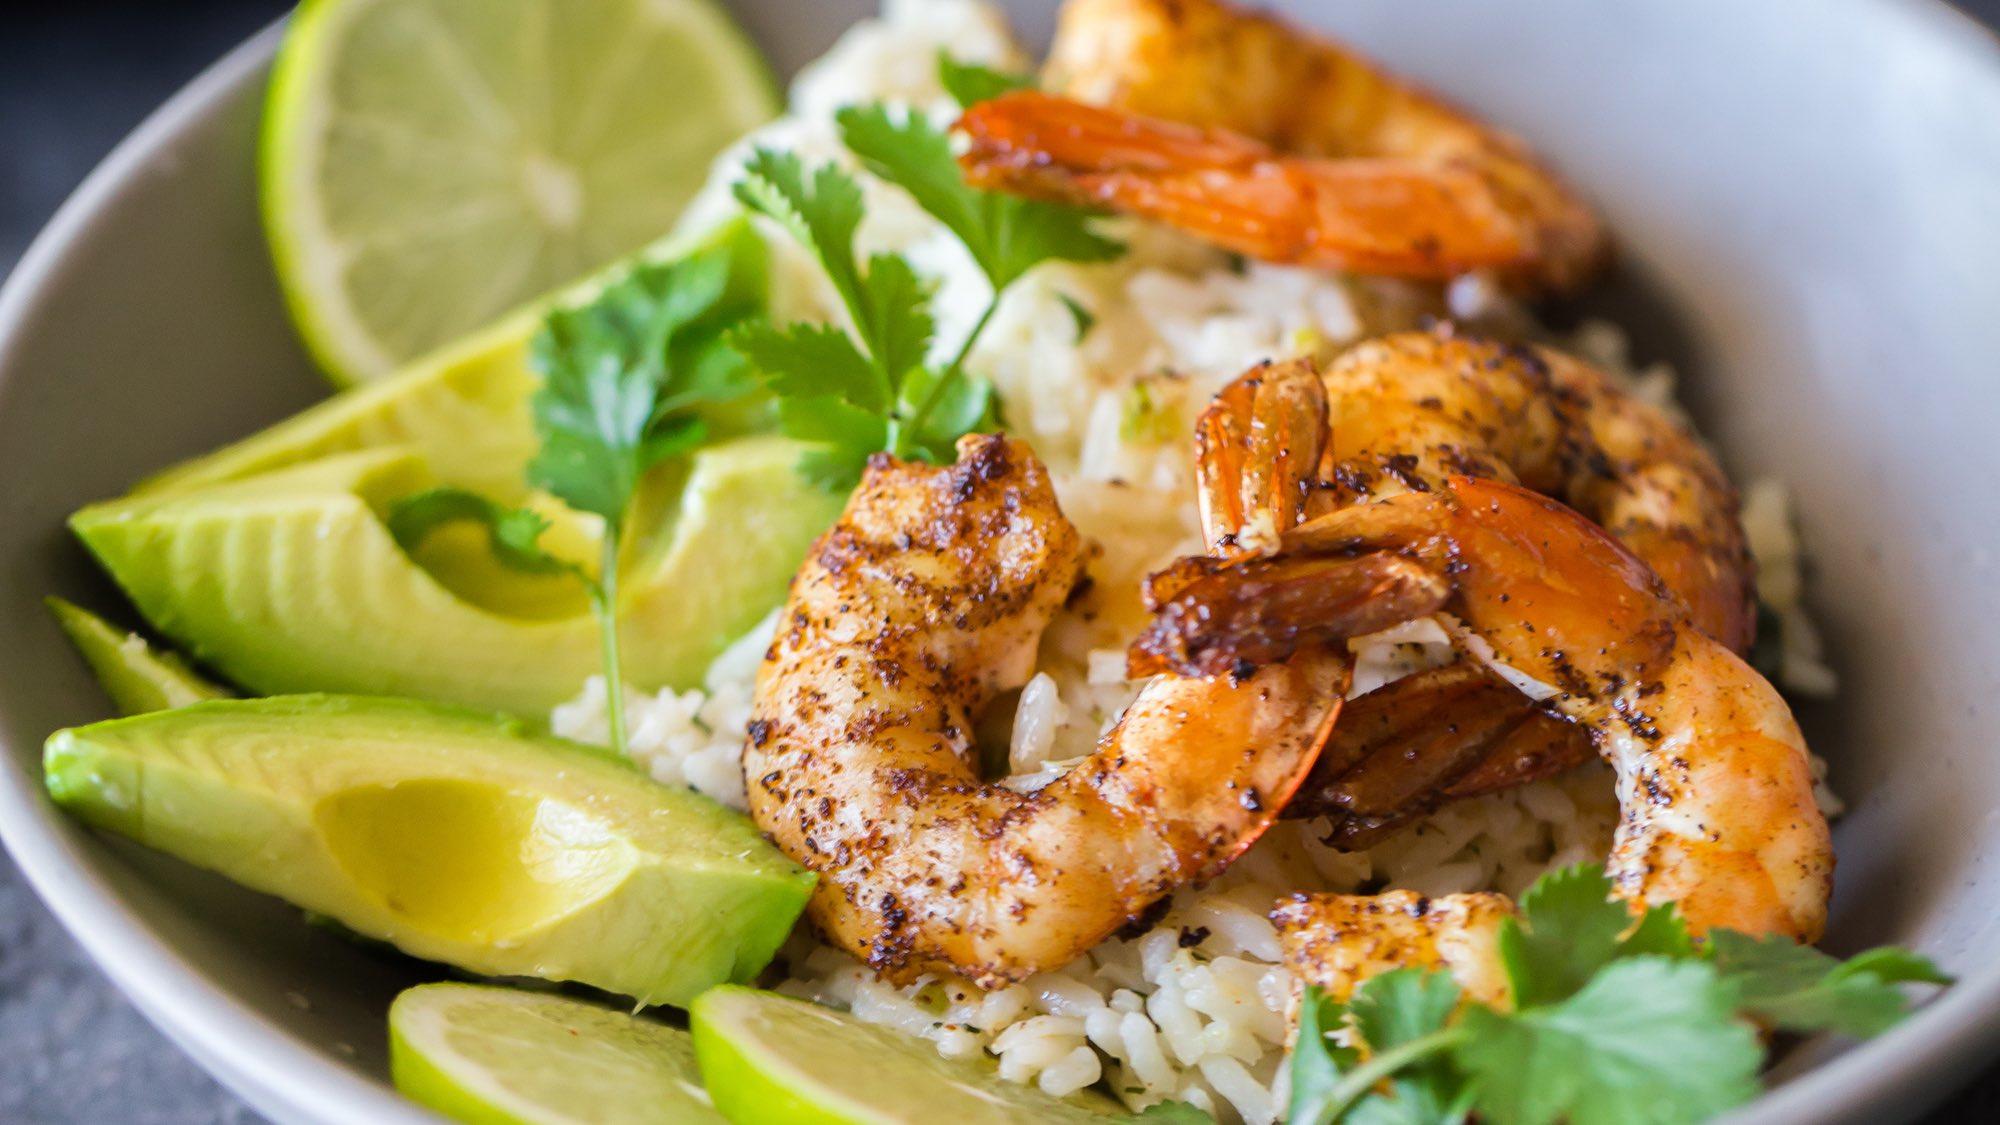 cilantro-lime-rice-shrimp-bowl.jpg